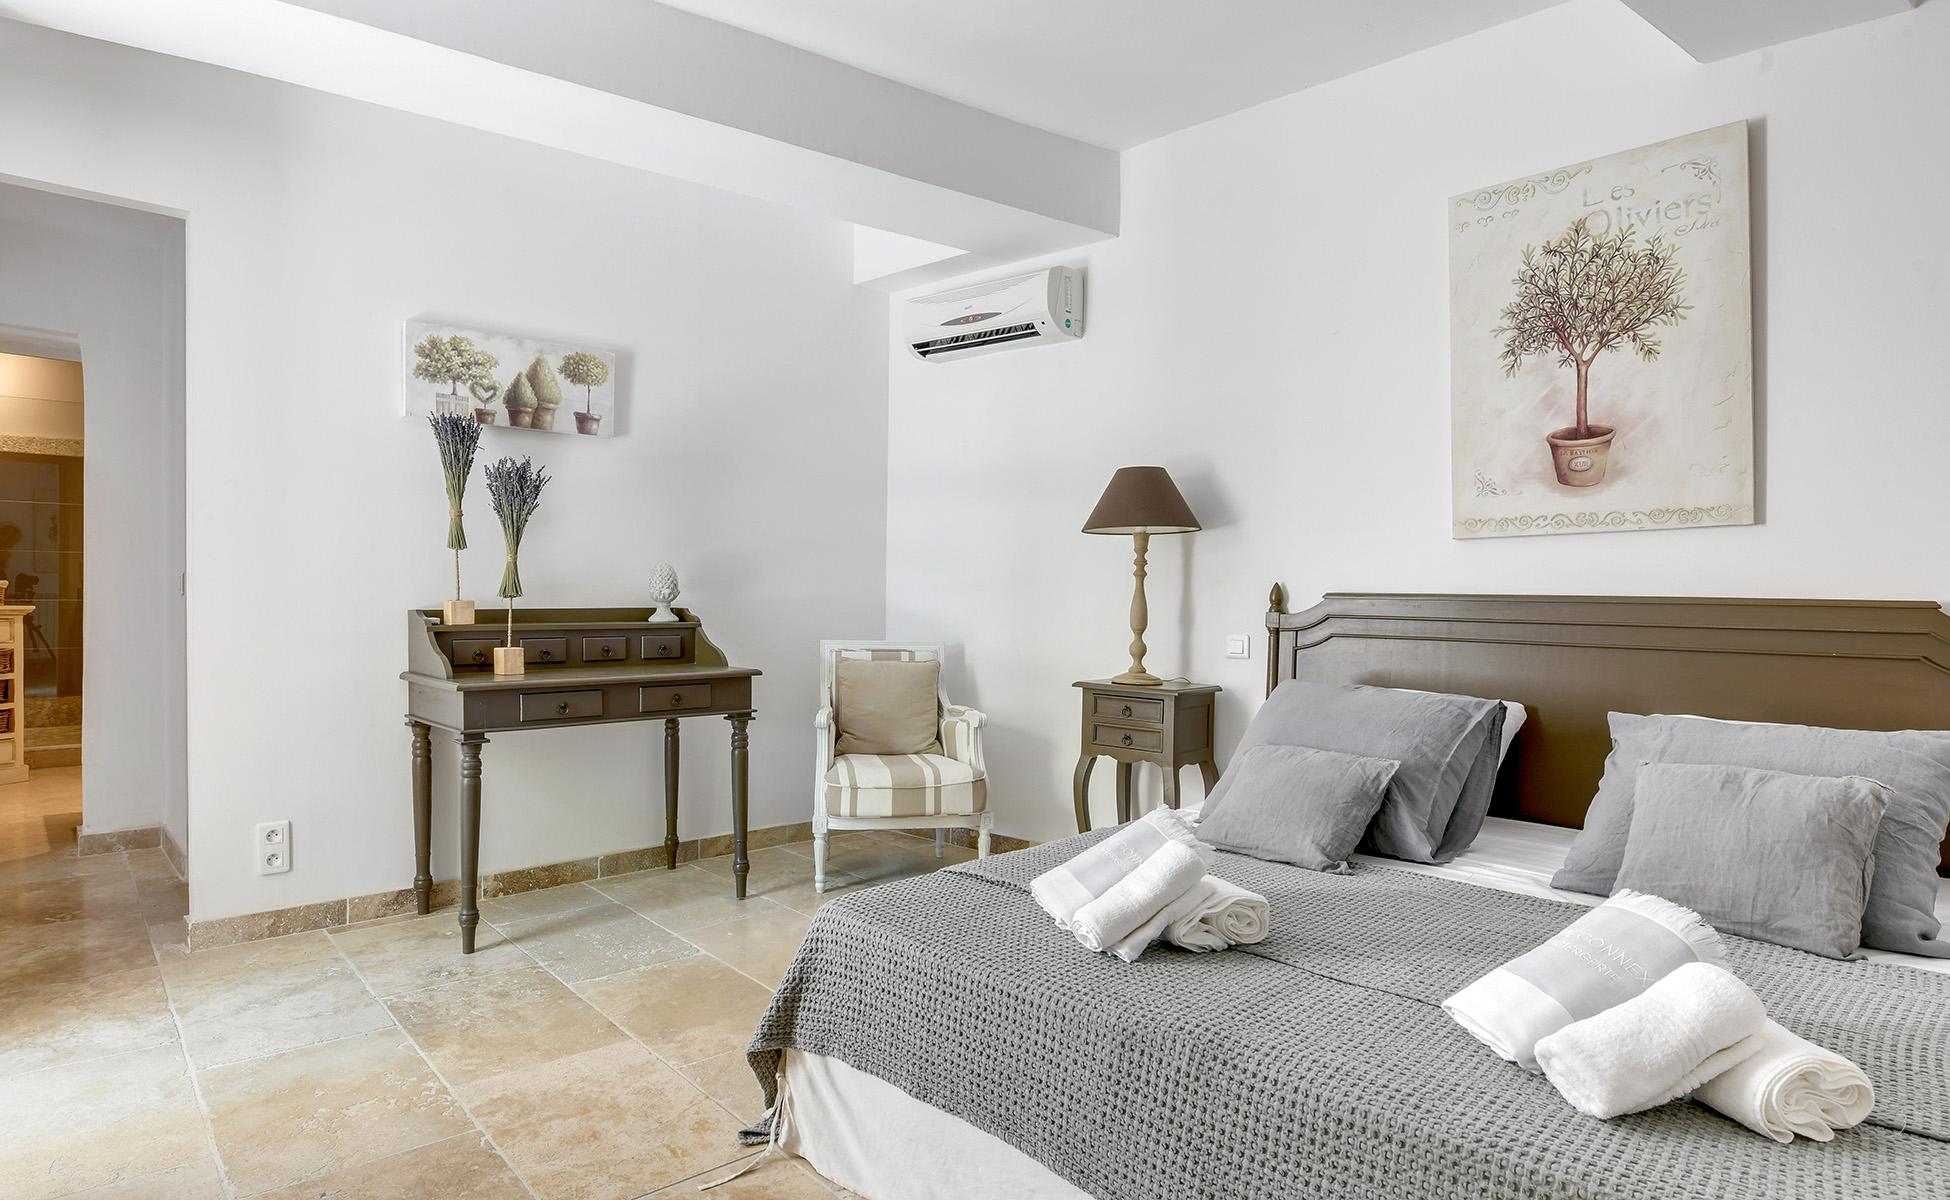 Lovelydays luxury service apartment rental - St Rémy de Provence and surroundings - Ameu Mas - Partner - 6 bedrooms - 6 bathrooms - Queen bed - 9792f657669a - Lovelydays